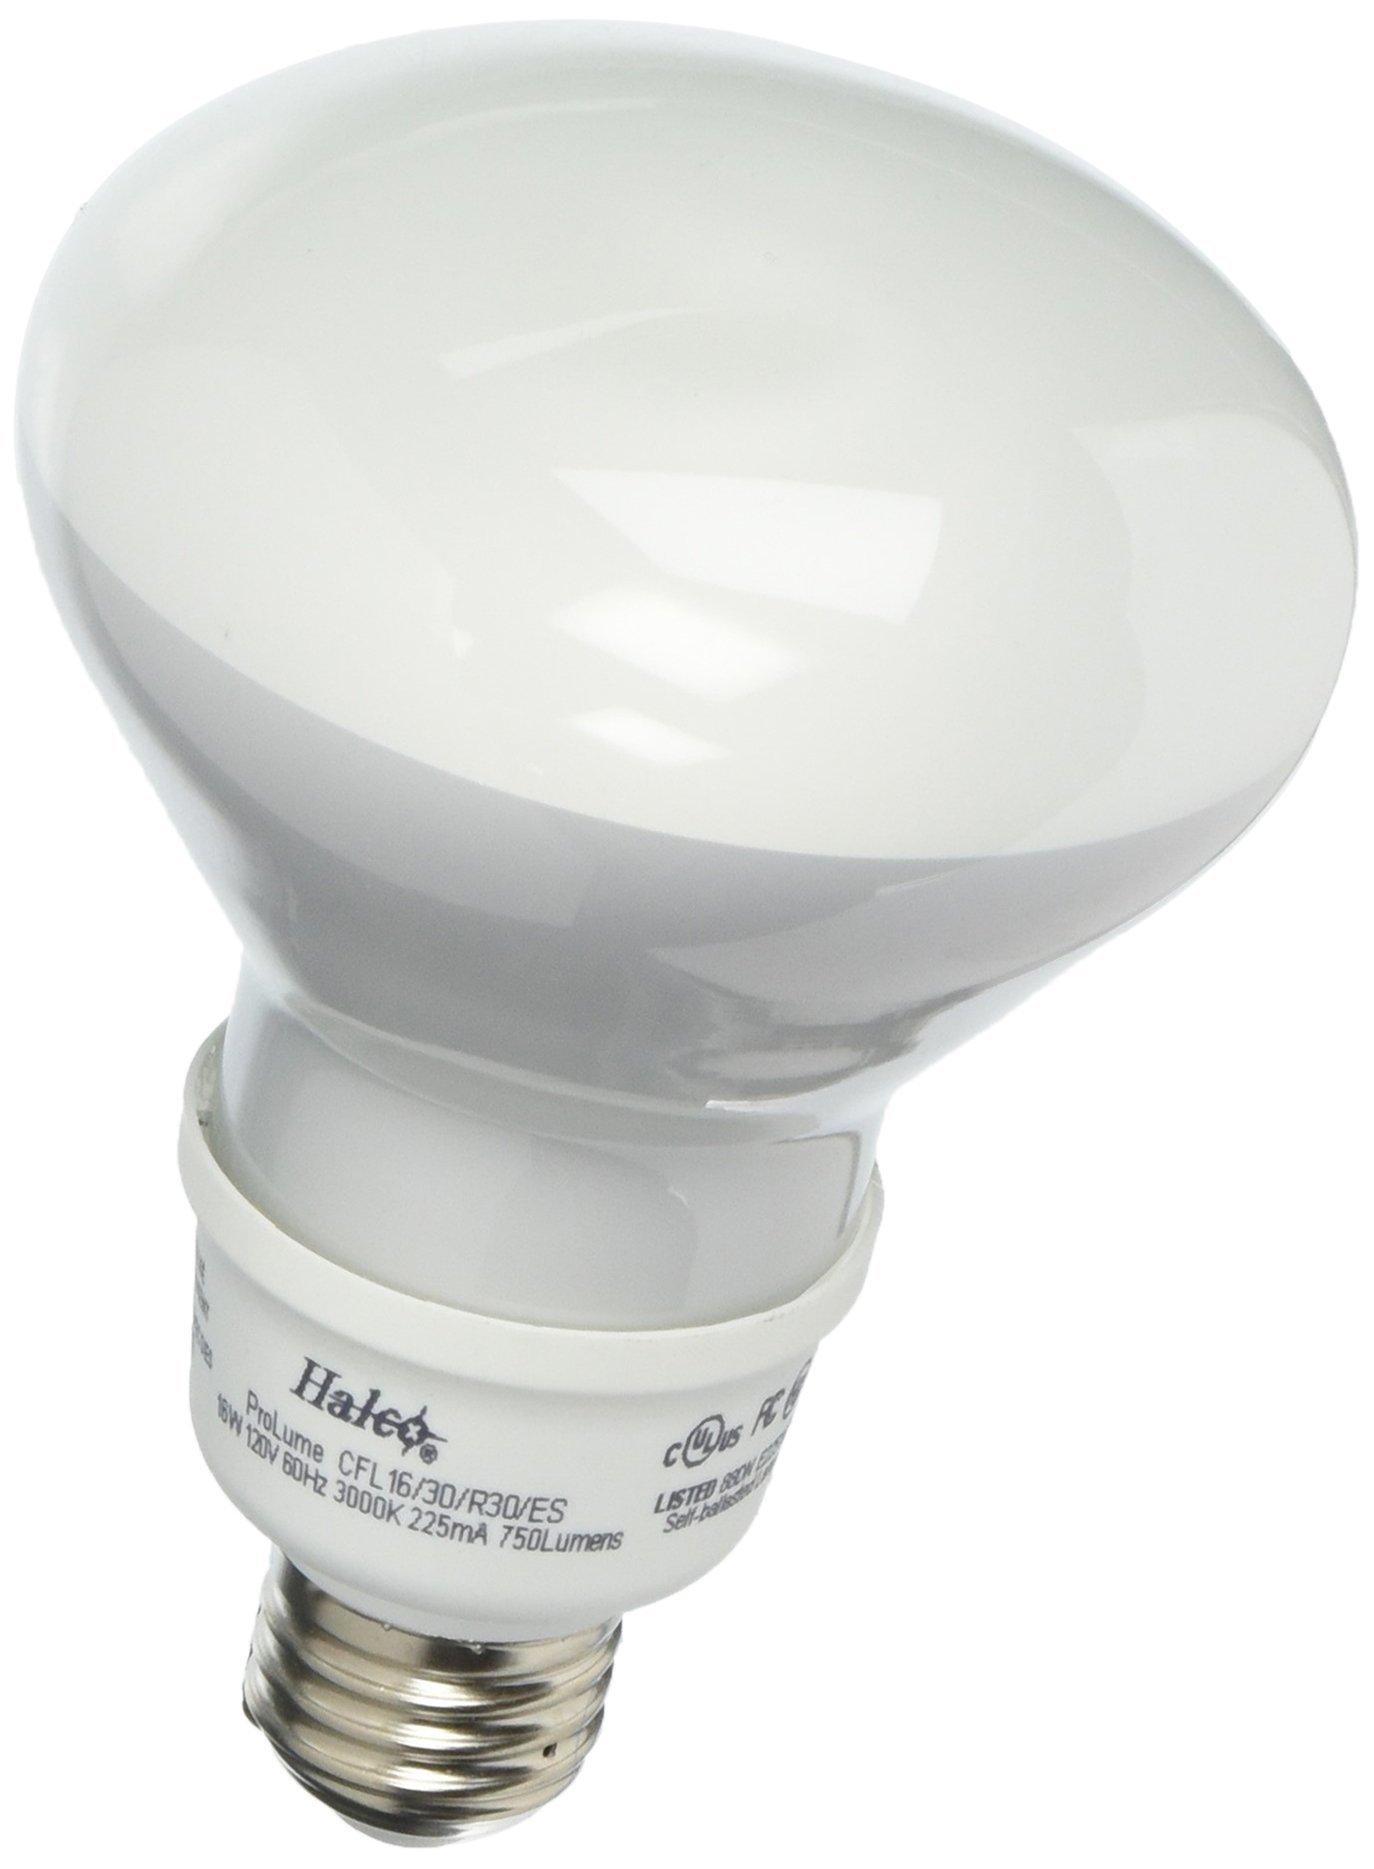 ProLume CFL16/30/R30/ES 46101 16W Spiral R30 3000K MED ProlumeME, 6 Piece